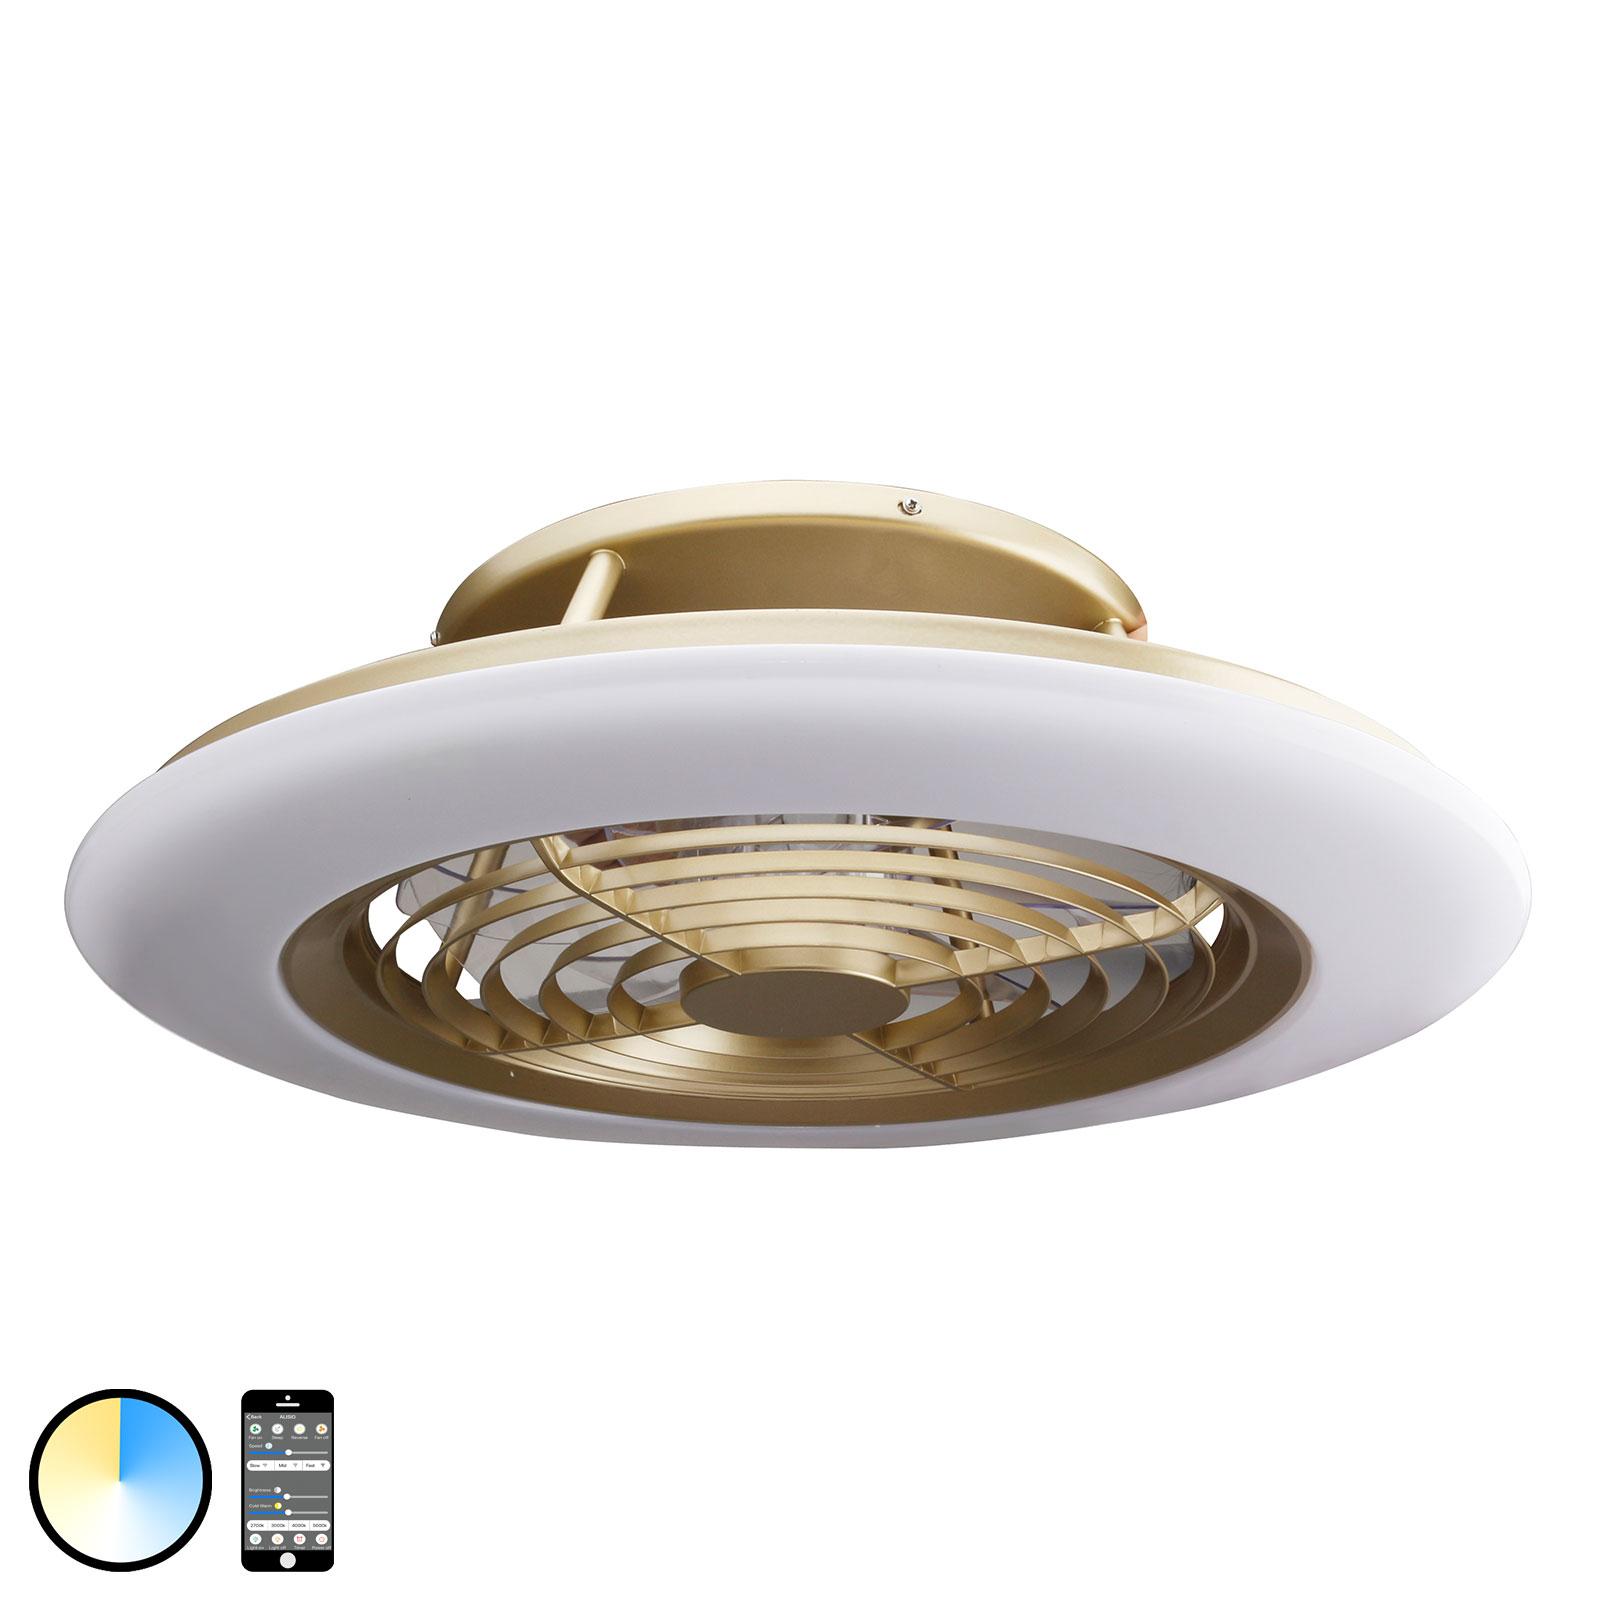 Ventilateur de plafond LED Alisio, appli, laiton